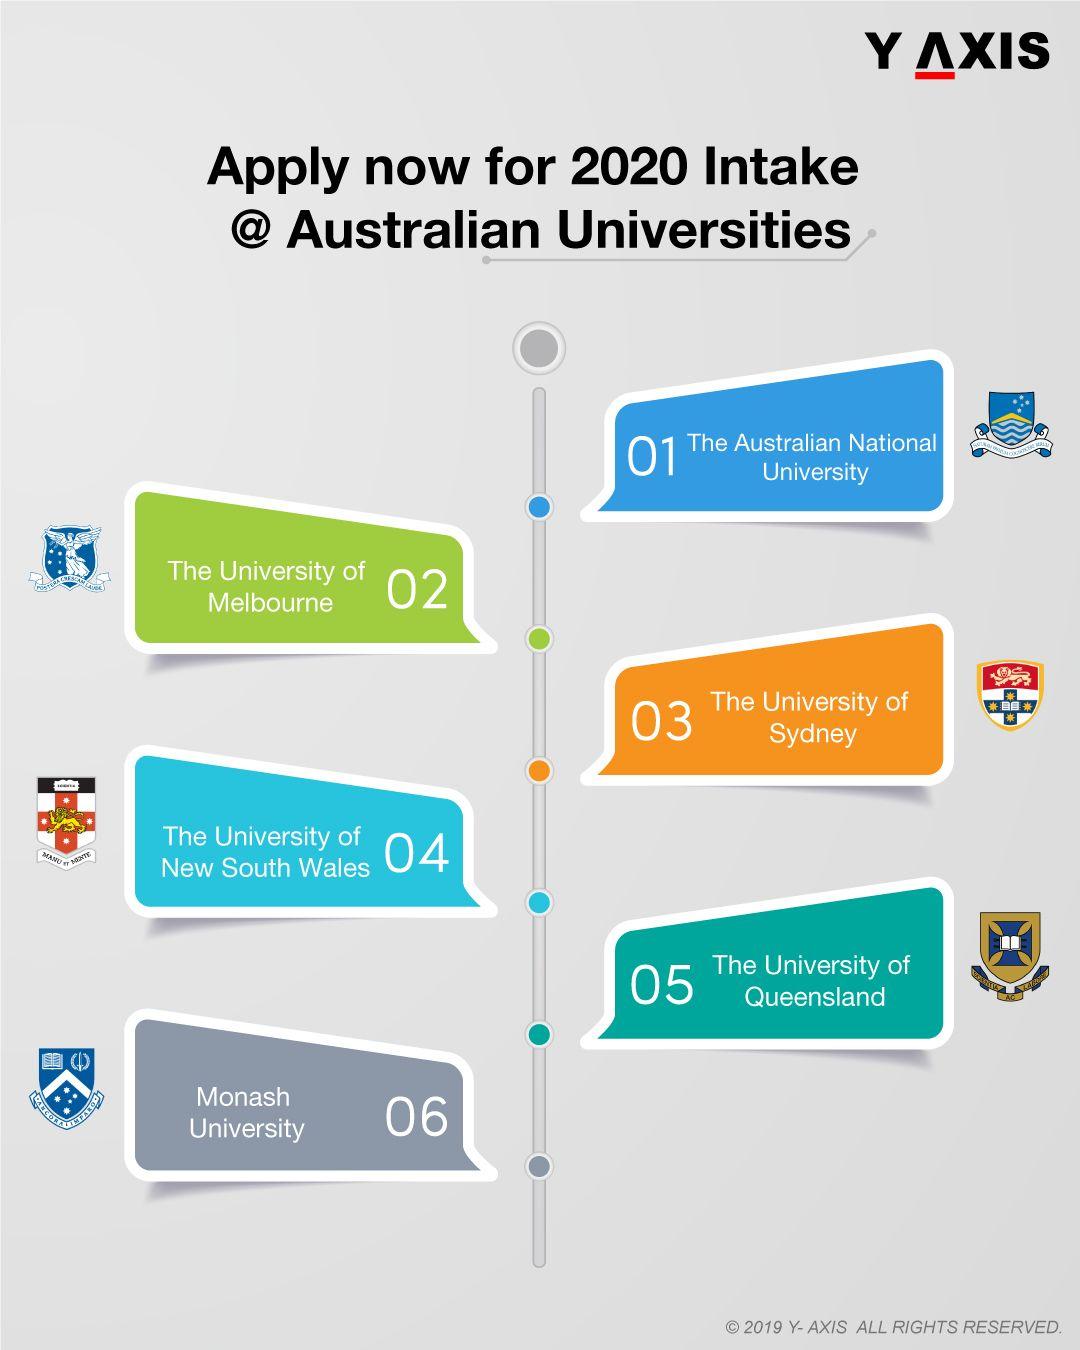 e01c113f35b954dac39df15d28ea9bb9 - Australian University Application Deadline 2020